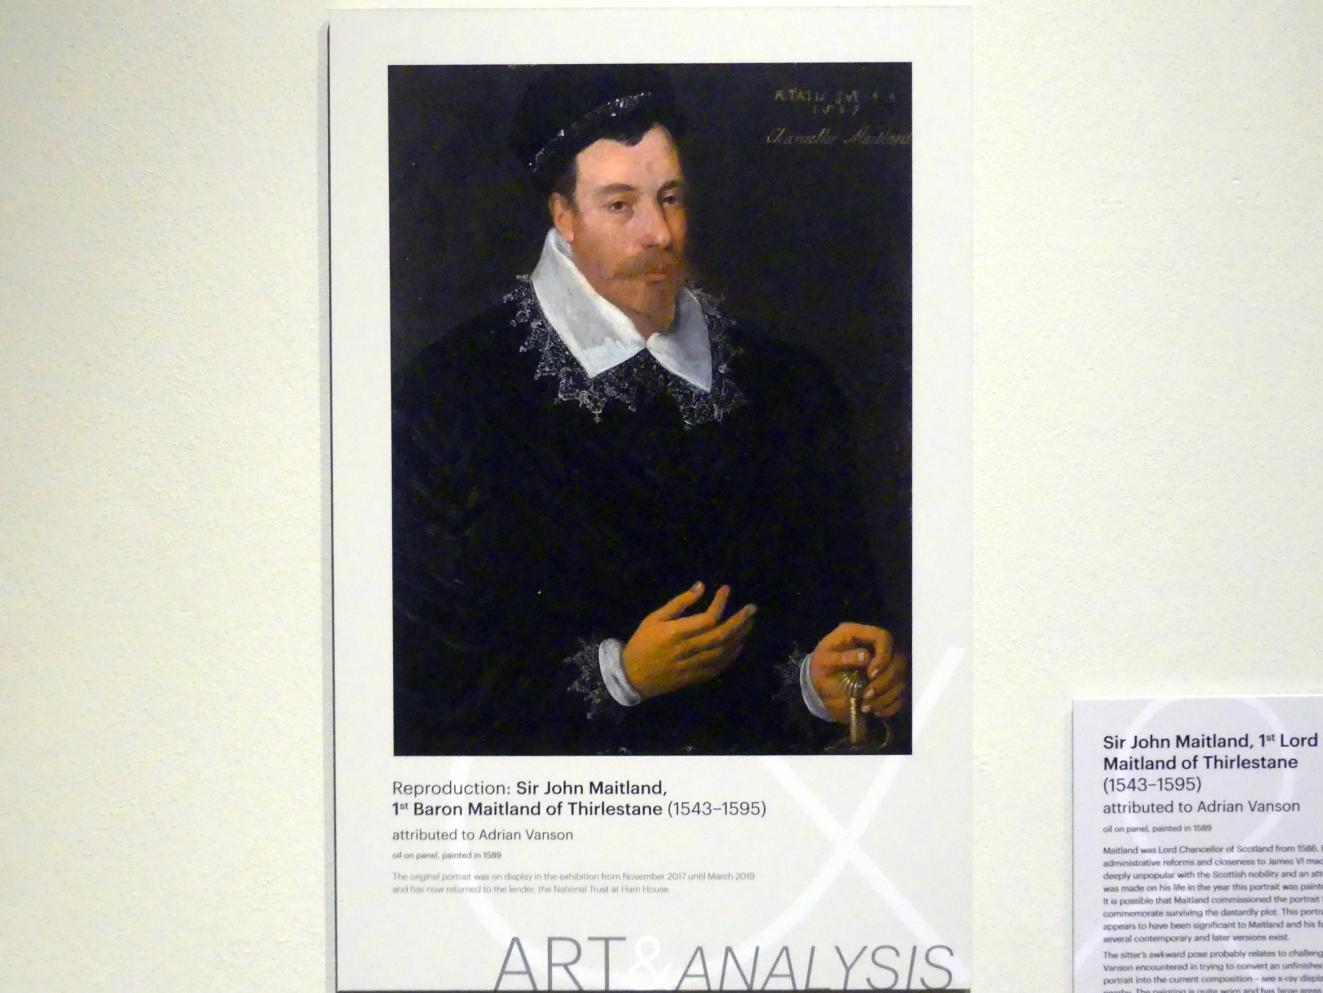 Adrian Vanson: John Maitland, 1st Lord Maitland of Thirlestane (1543-1595), 1589